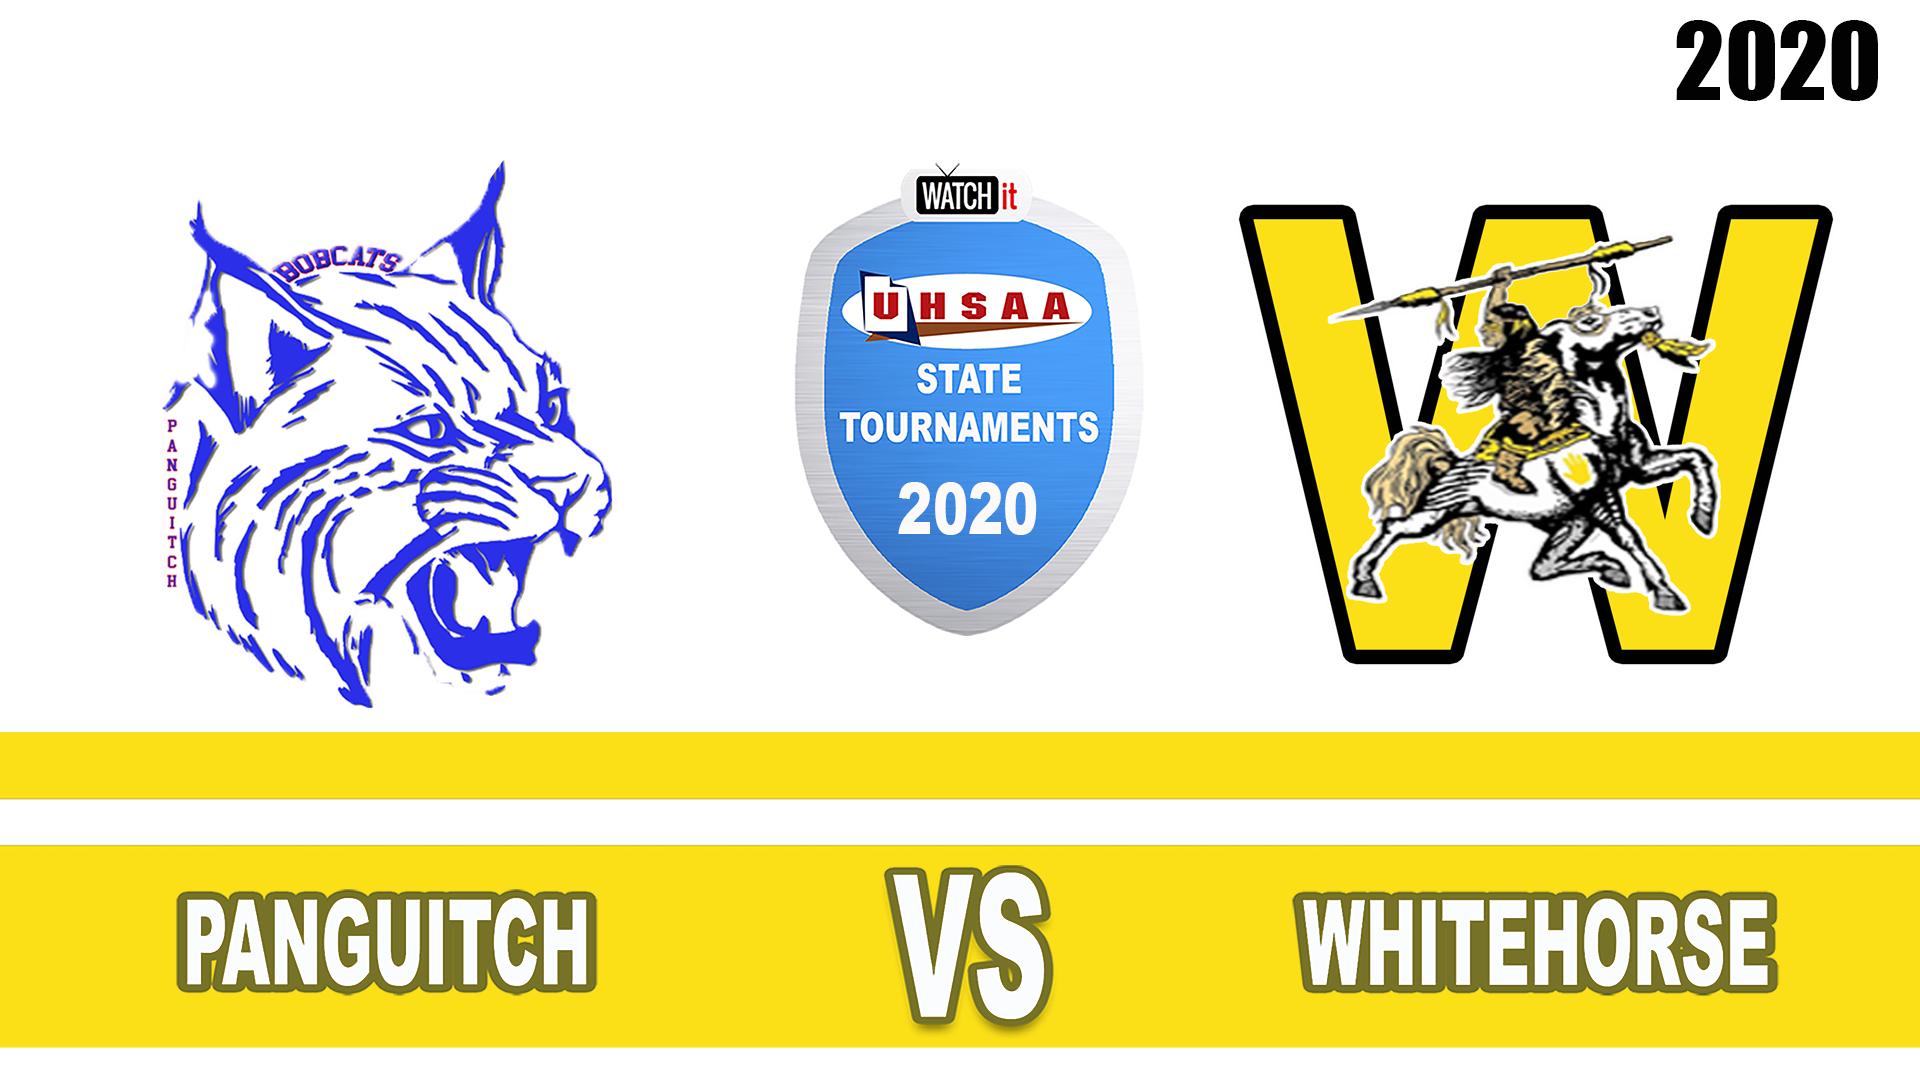 Panguitch vs Whitehorse